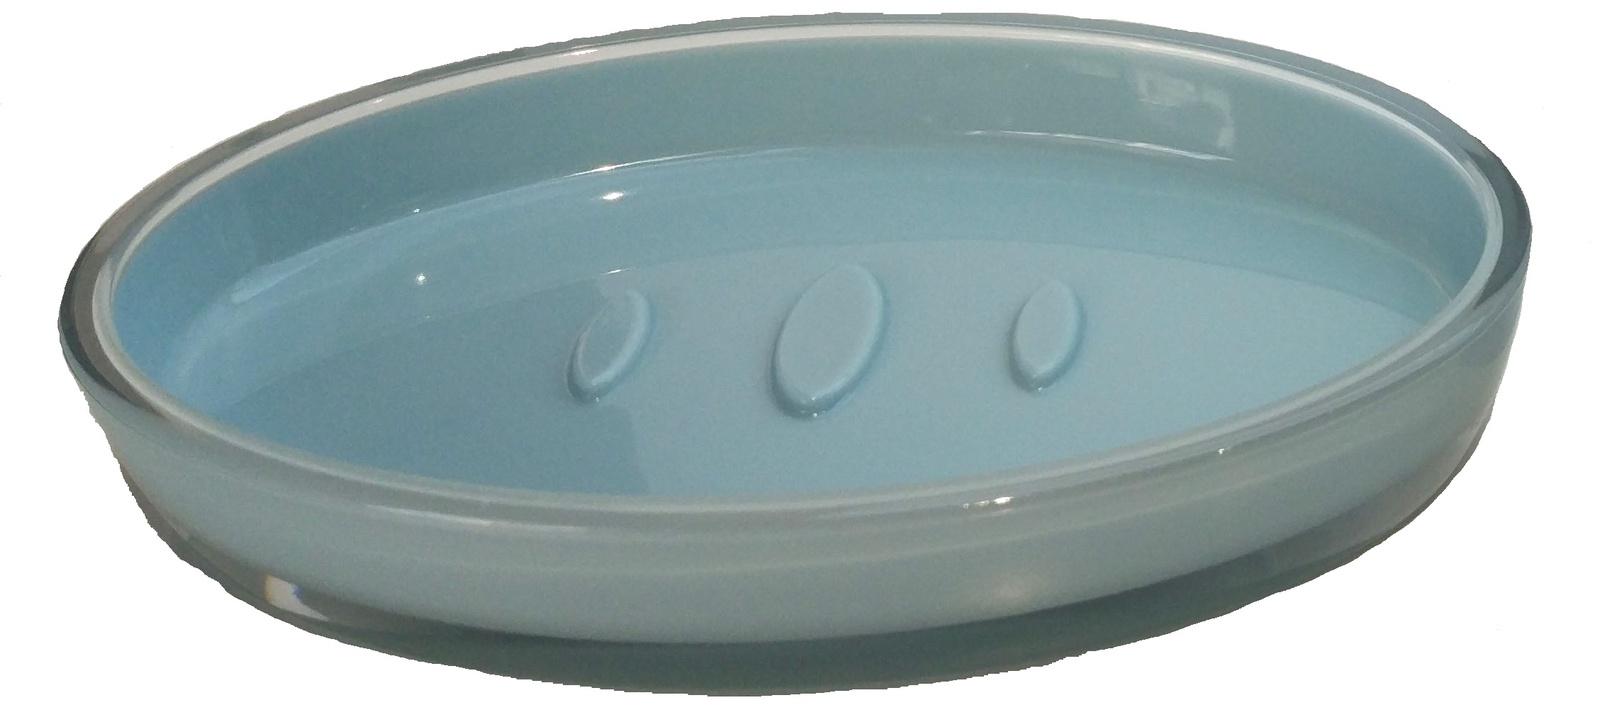 Мыльница Vanstore 316-04, голубой мыльница vanstore корона